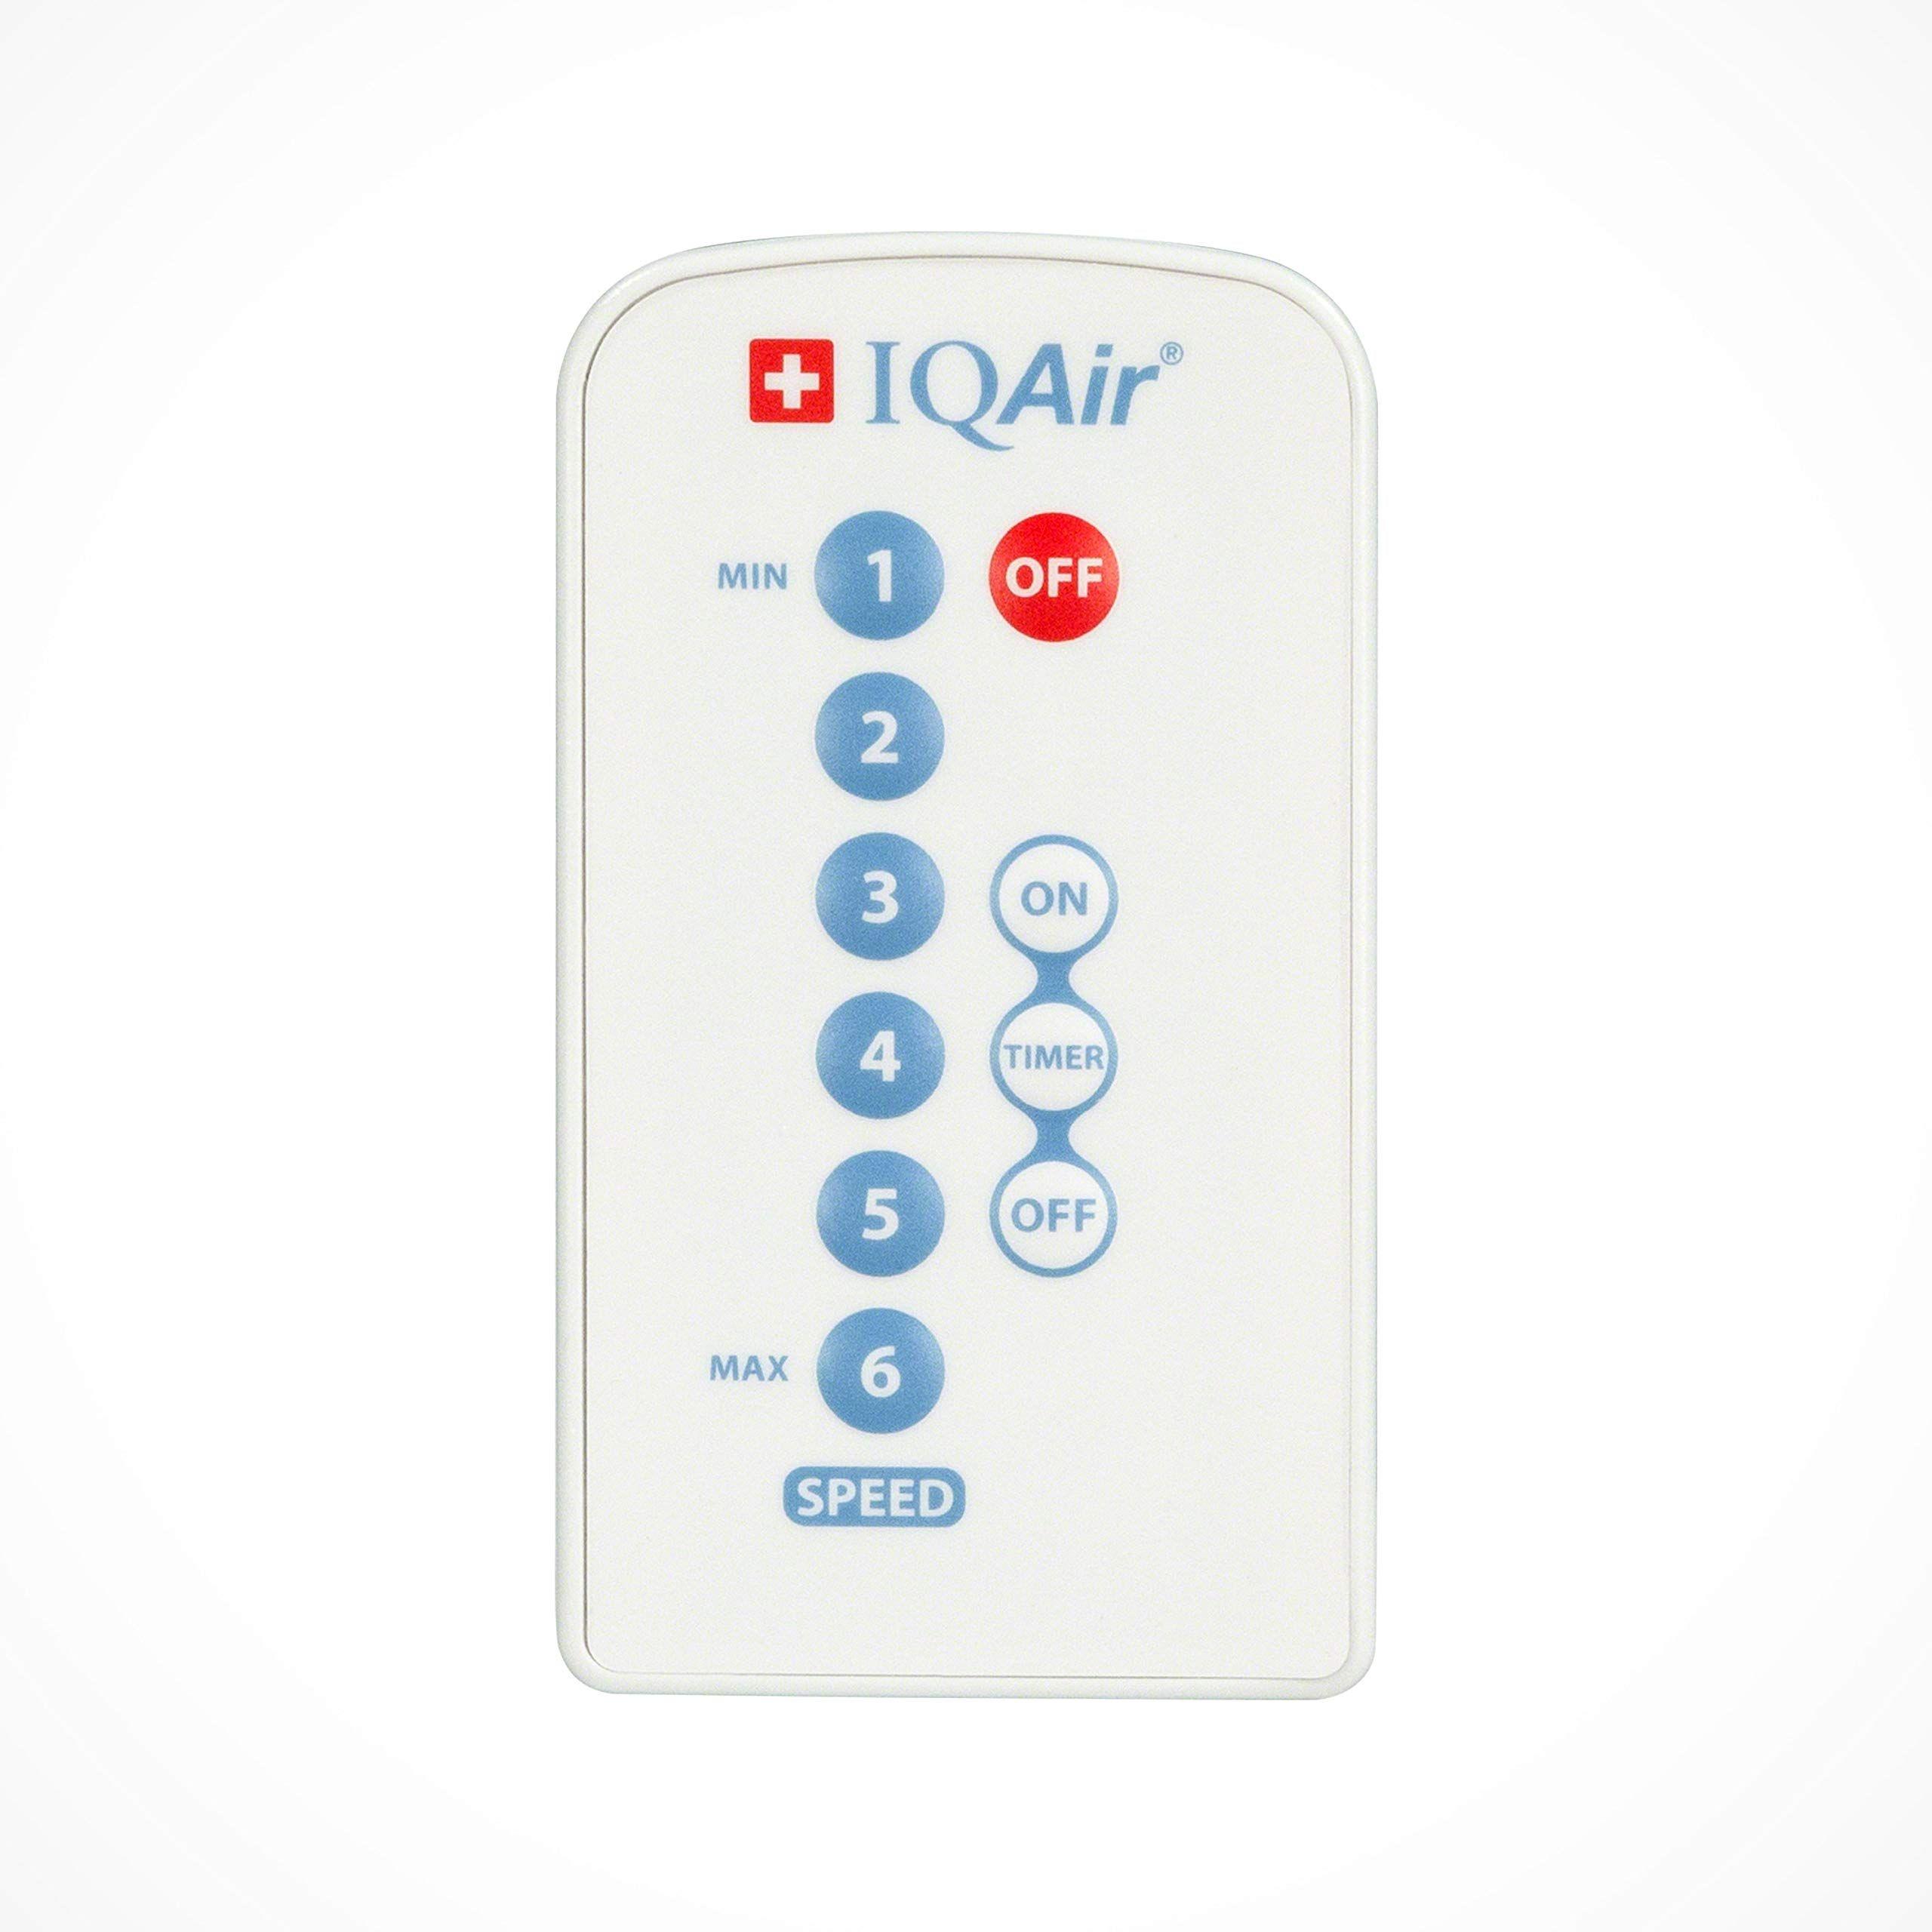 Iqair Healthpro Plus Air Purifier Medicalgrade Air Hyperhepa Filter Allergies Pets Asthma Odors Smoke Pollen Dust S Air Purifier Hepa Air Purifier Asthma